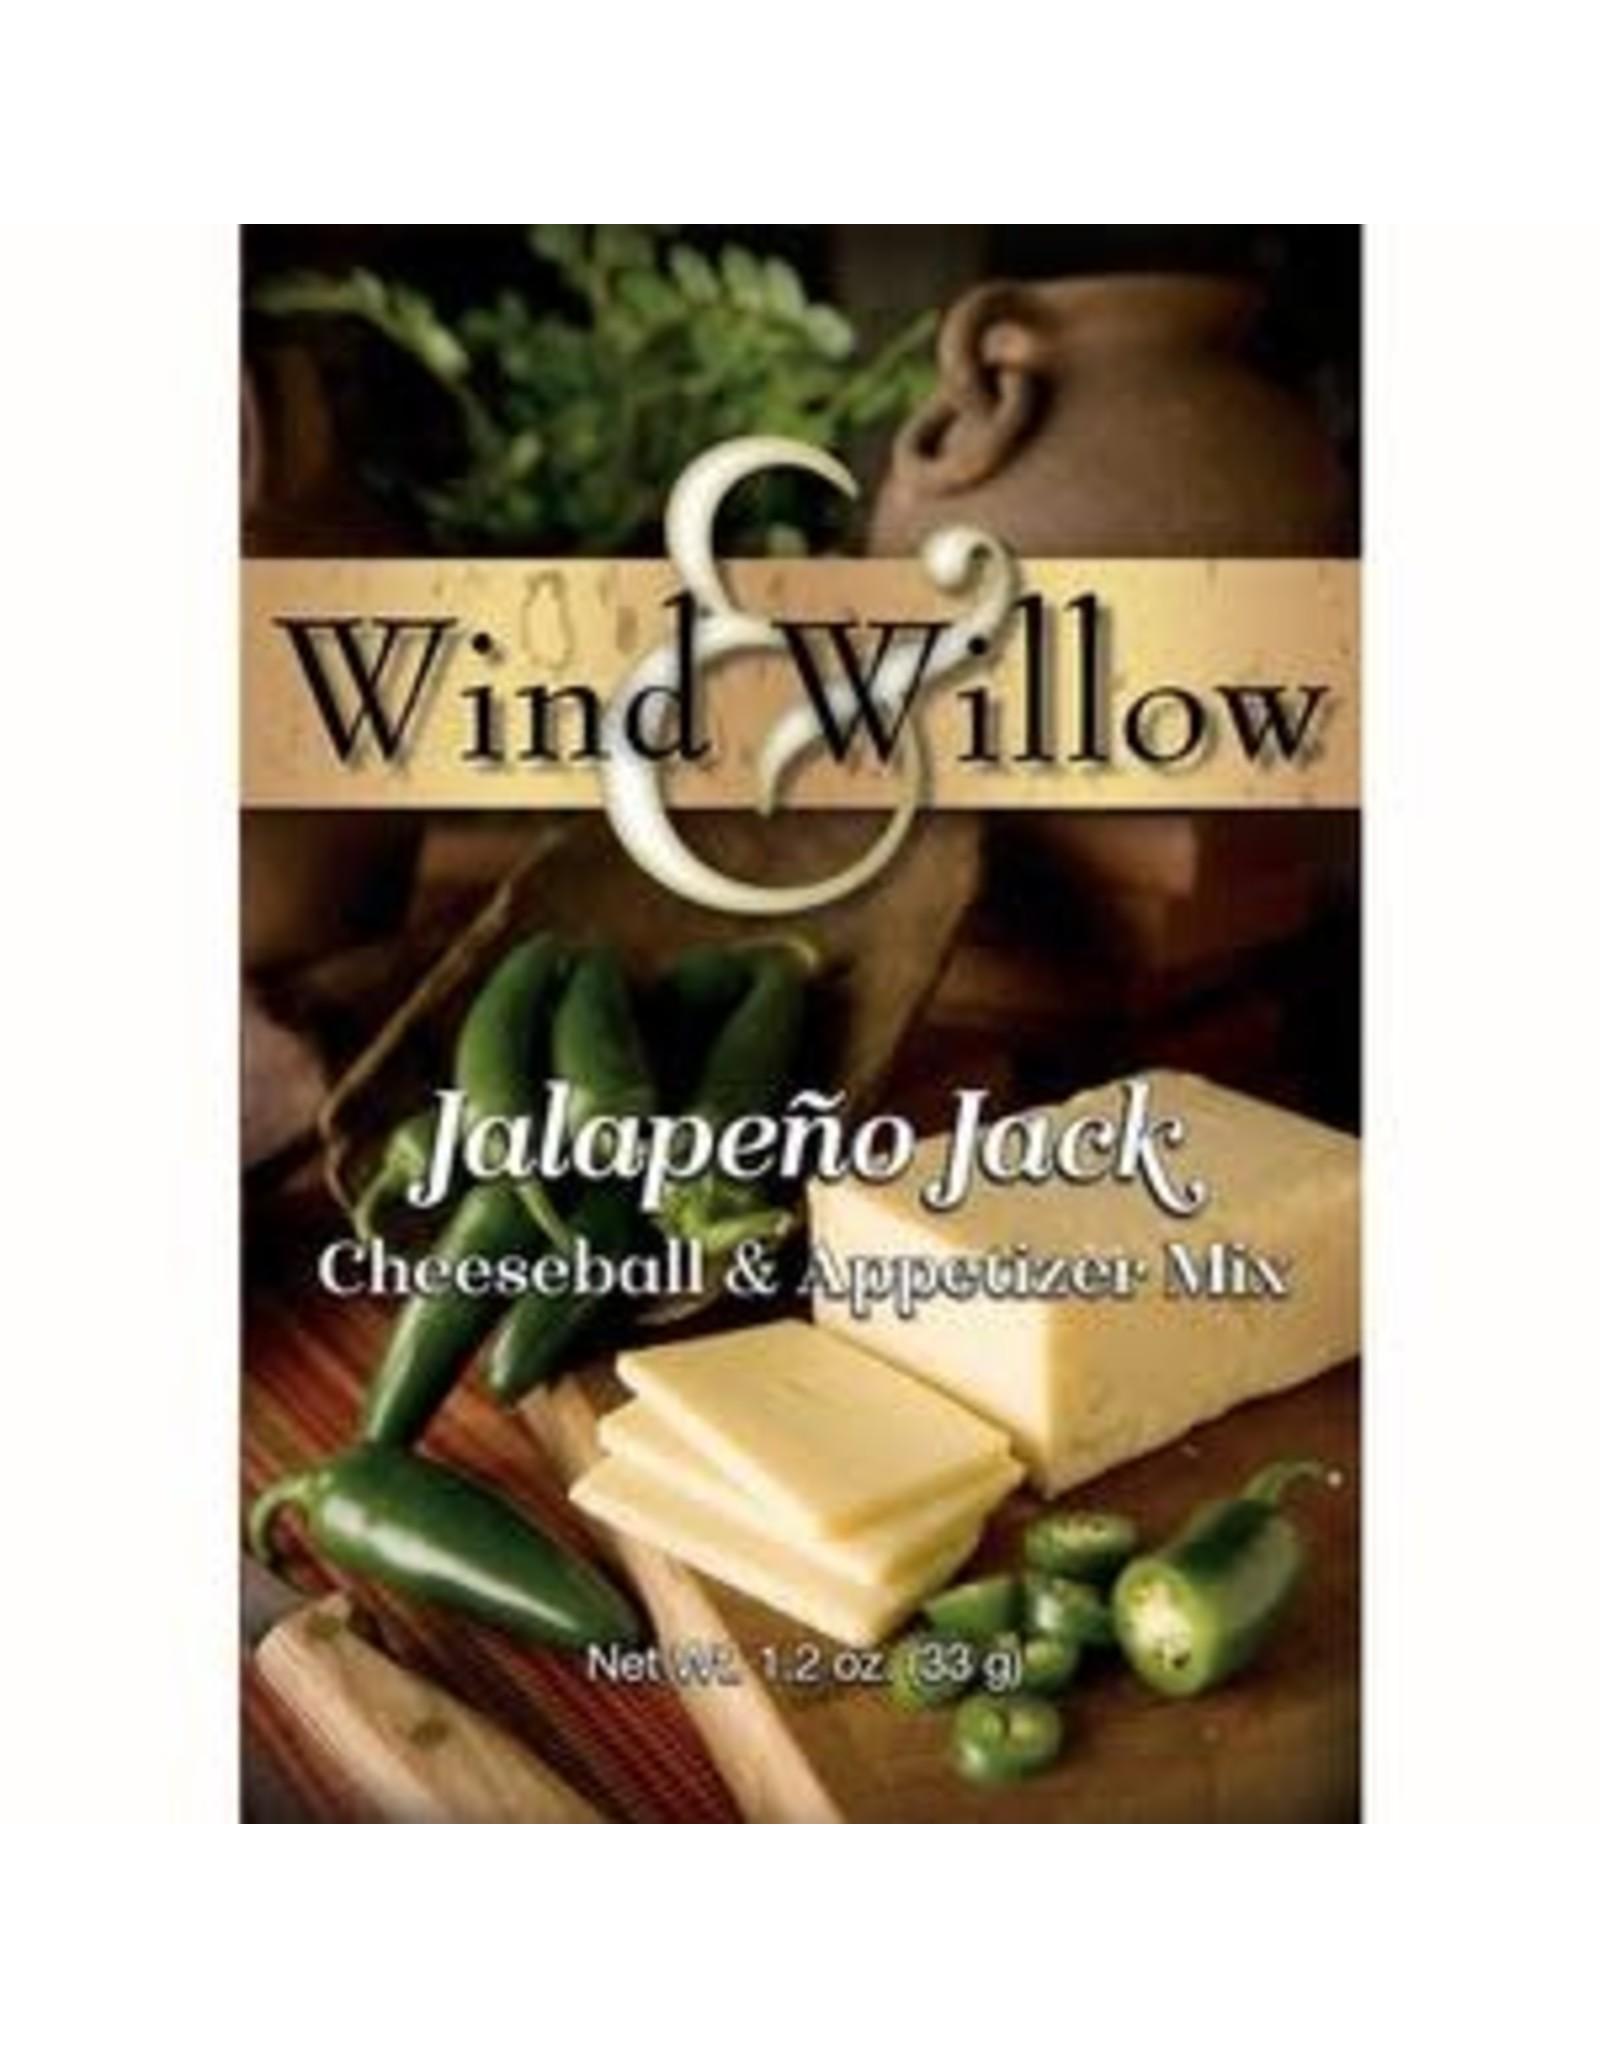 Wind & Willow Jalapeno Jack Cheeseball Mix, 1.2oz